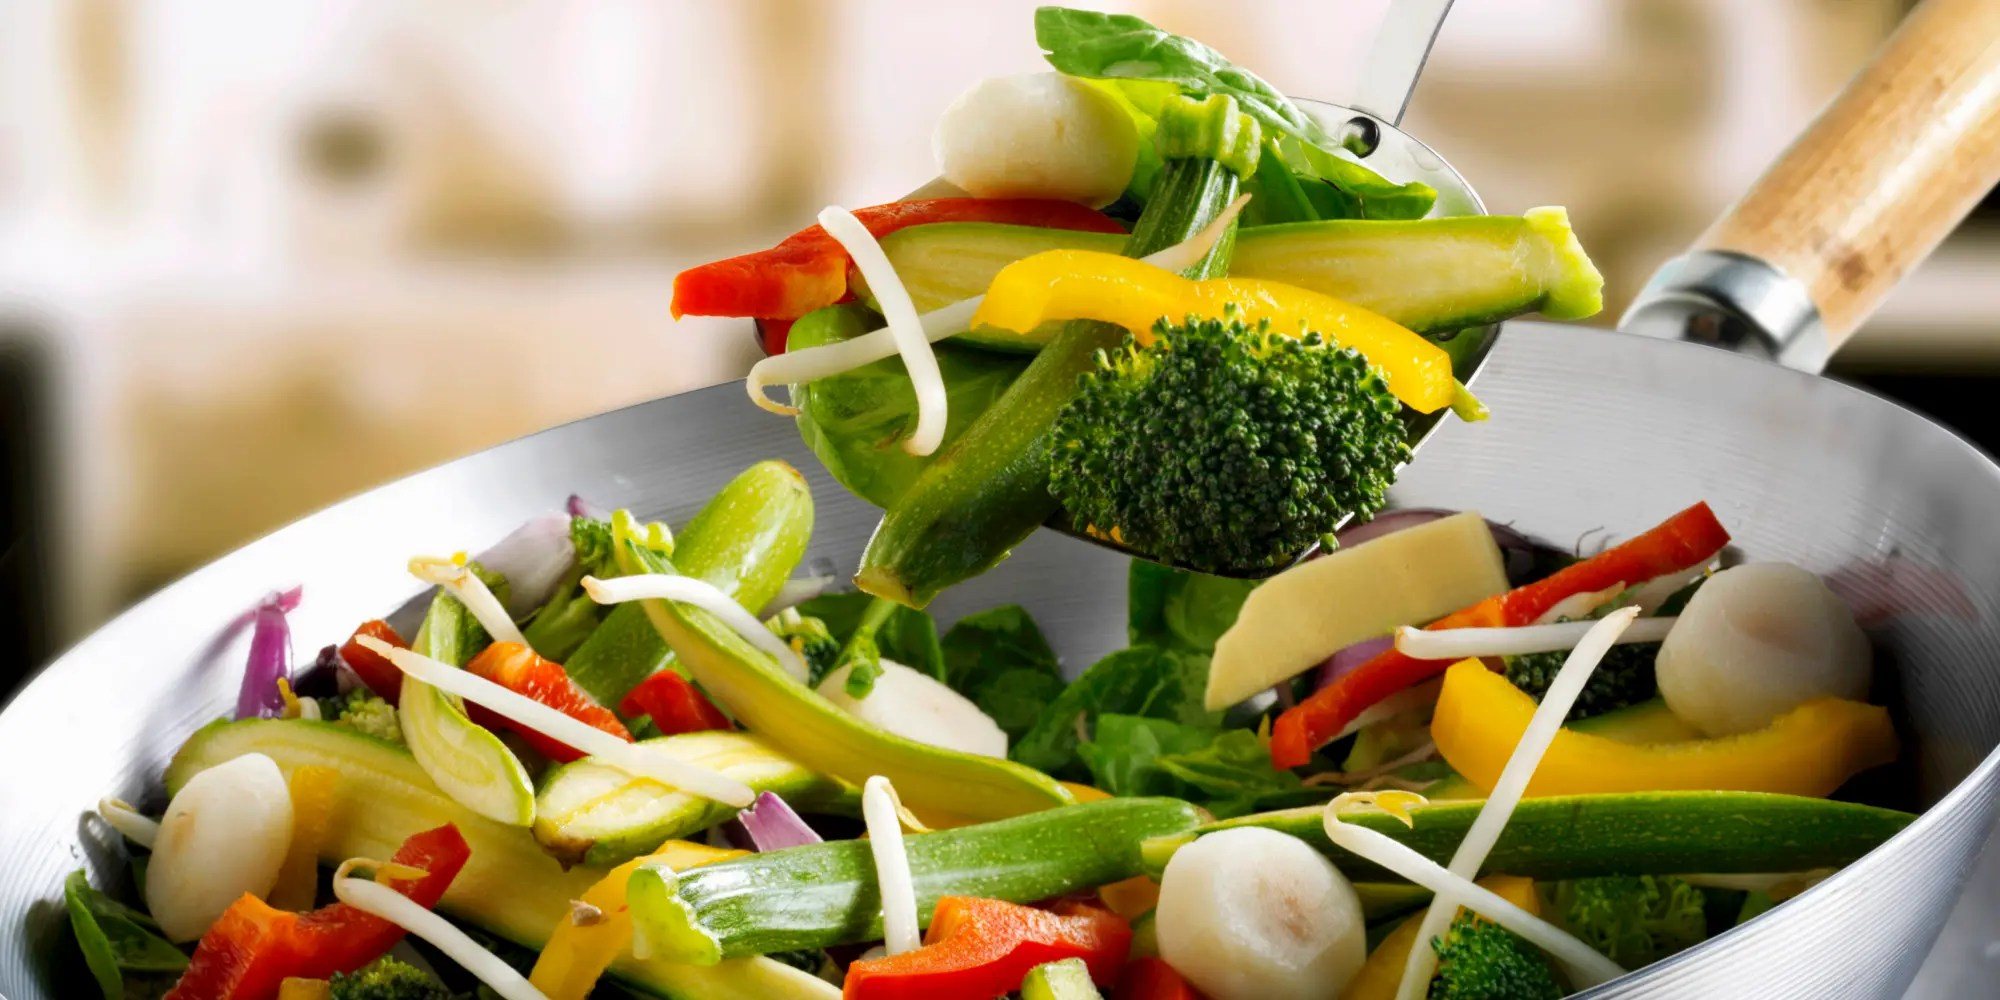 Dieta vegetariana 1000 calorias diarias